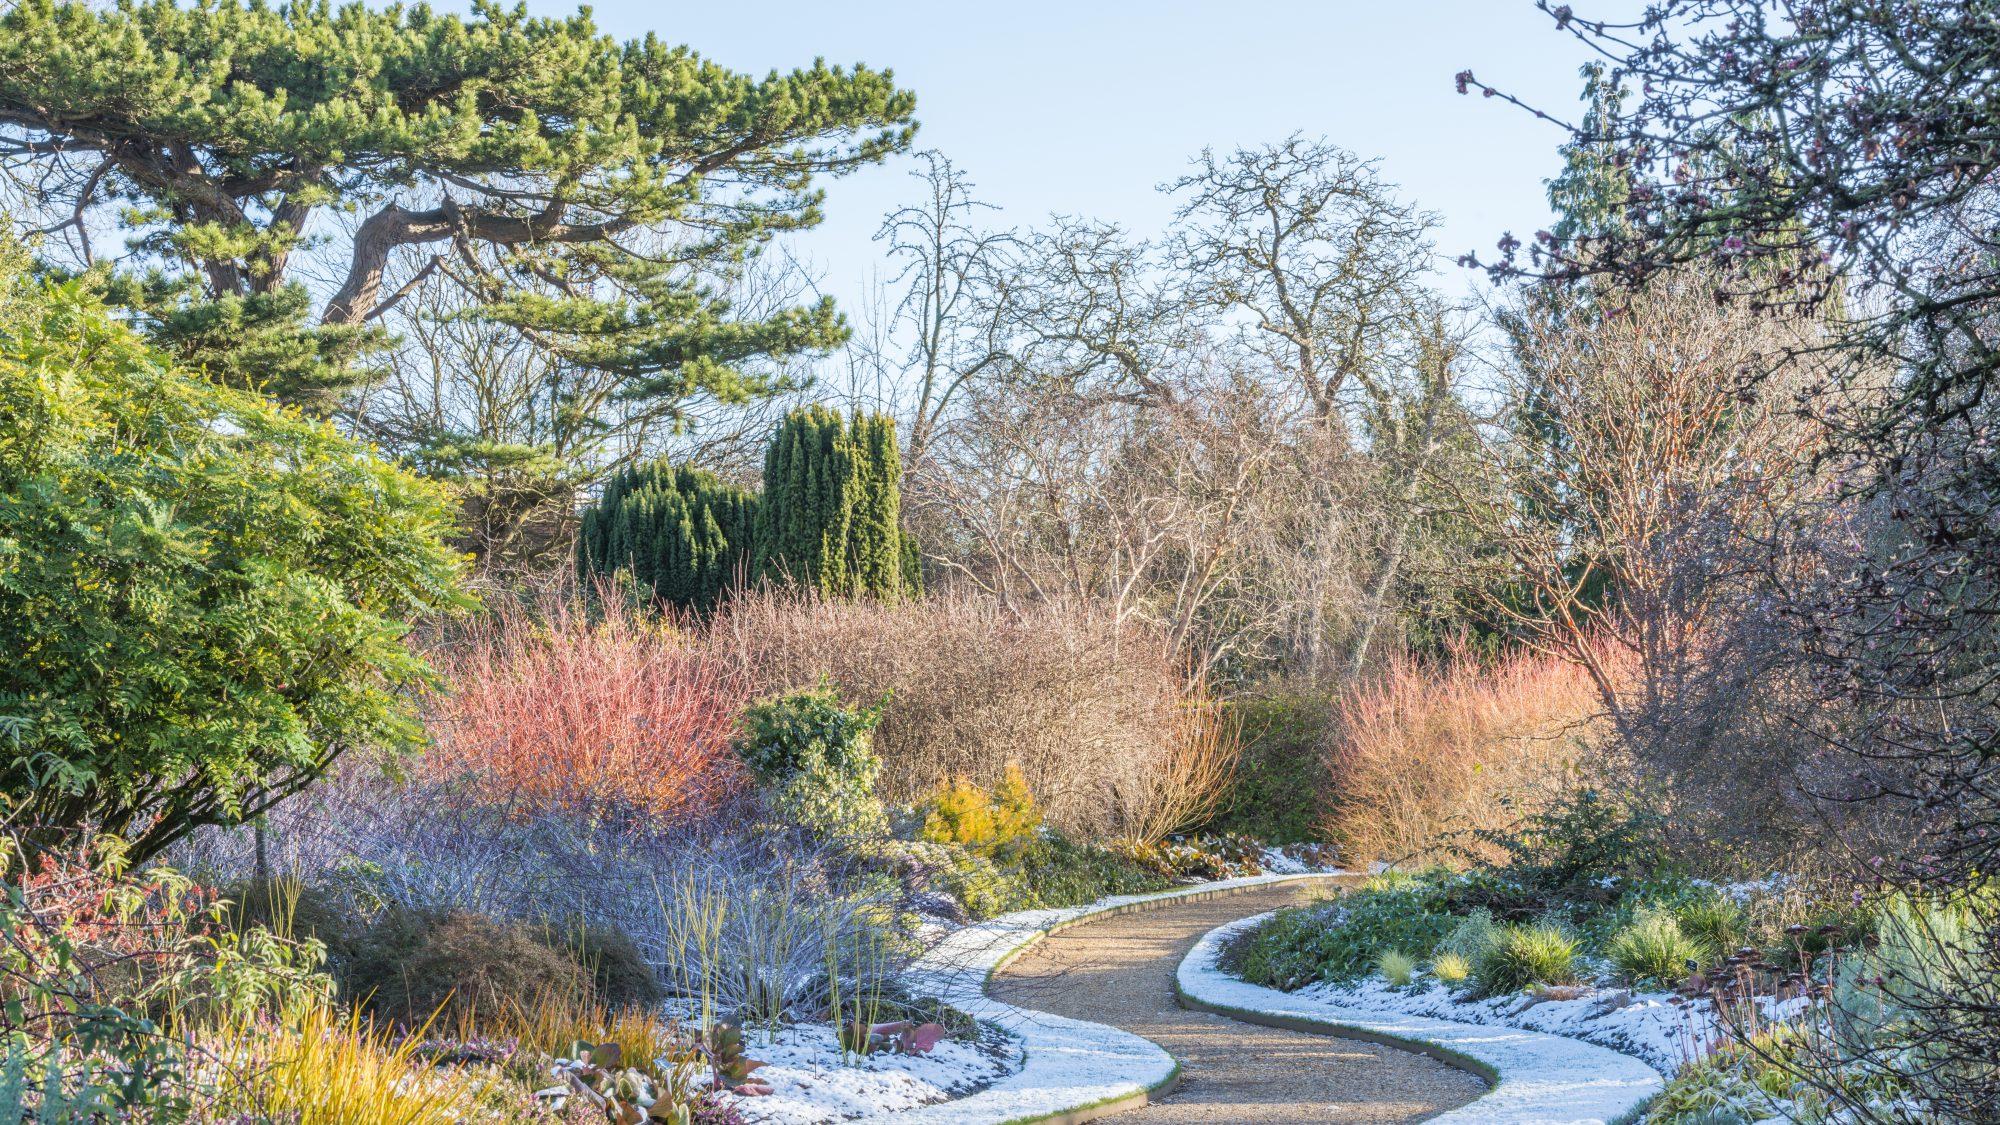 The Winter Garden at Cambridge University Botanic Garden showing multicolured trees, shrubs, foliage and flowers